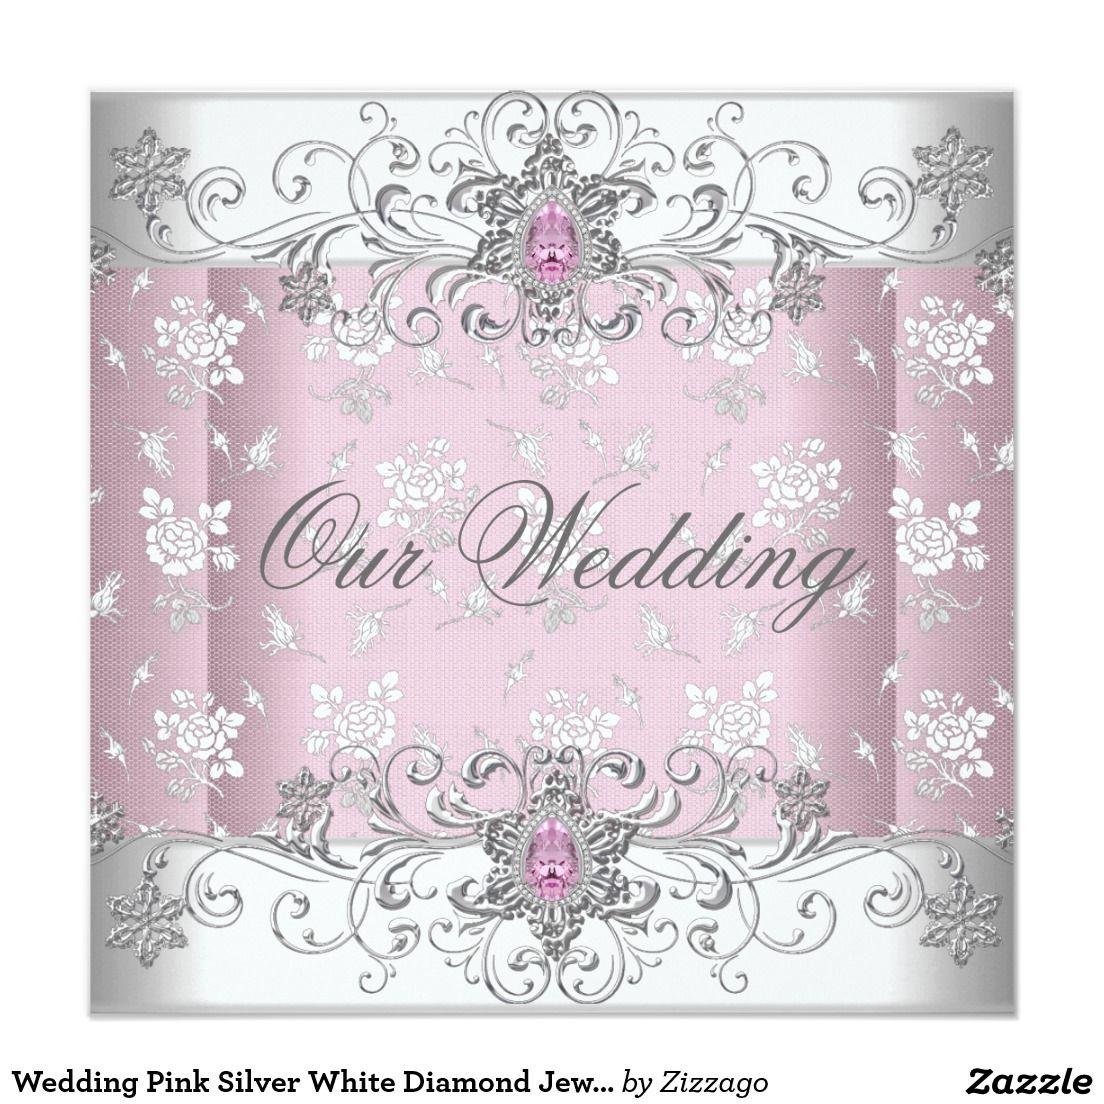 Wedding Pink Silver White Diamond Jewel Lace Card | Lace weddings ...